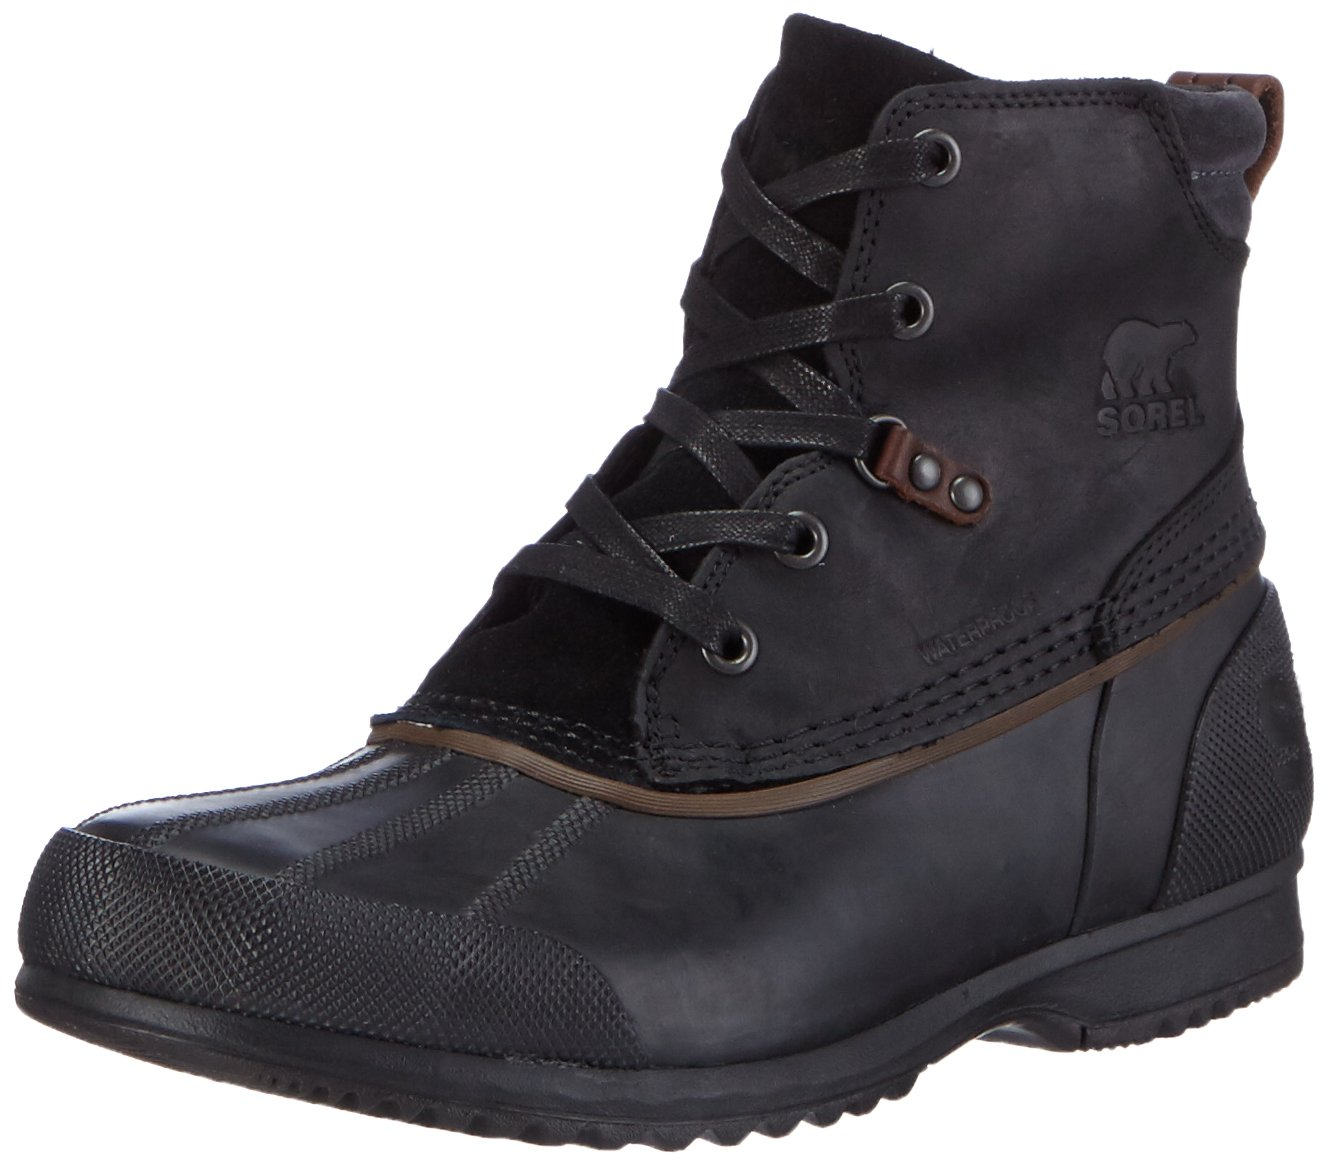 SOREL Men's Ankeny Snow Boot, Black, Grill, 13 D US by SOREL